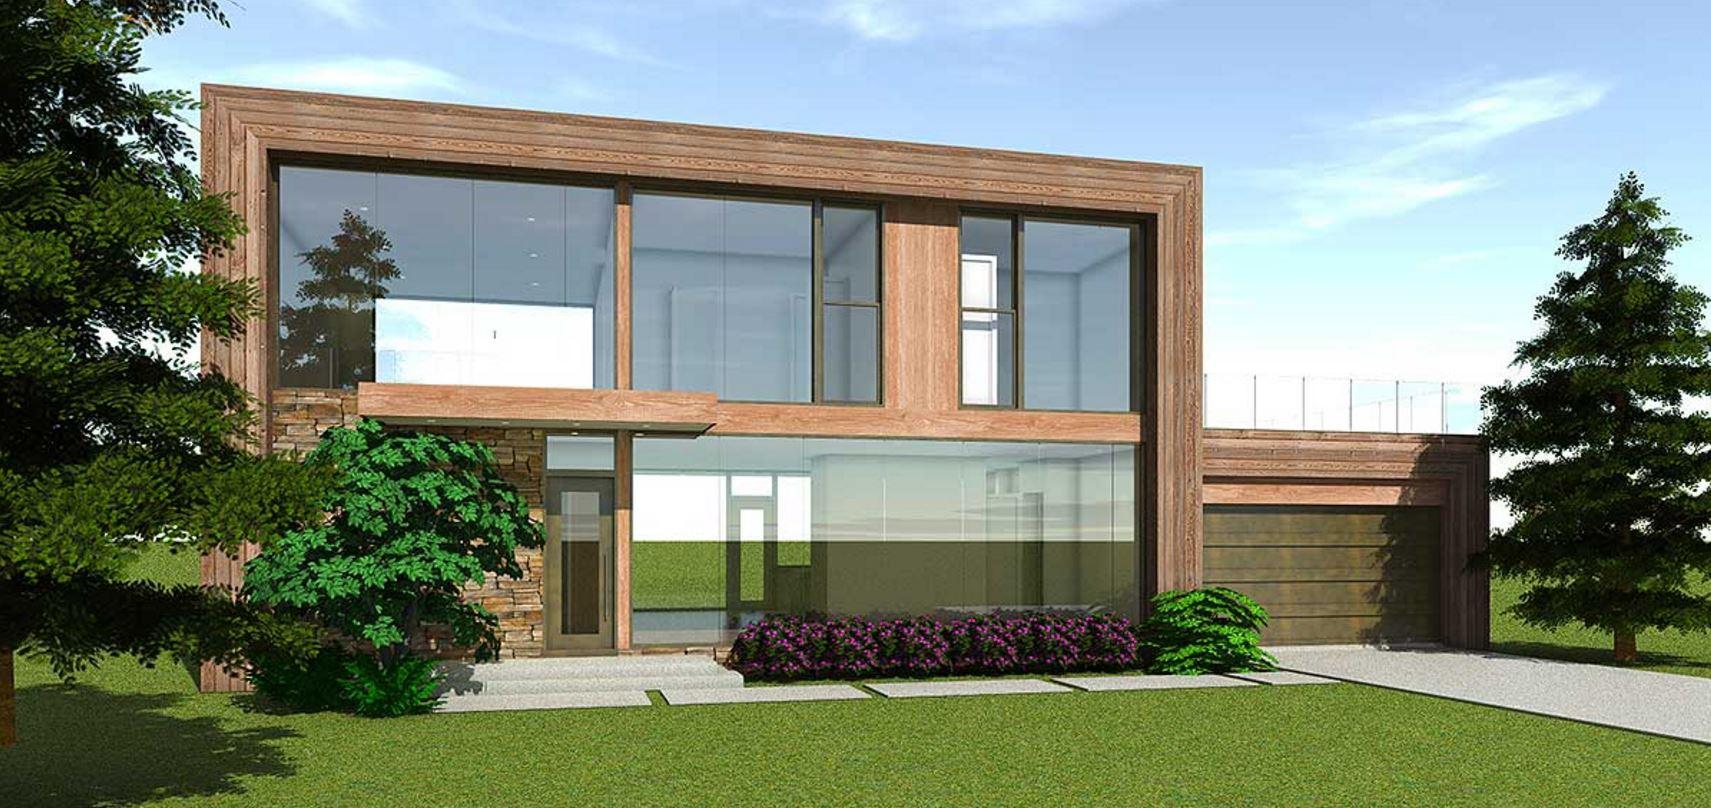 Casa con ventanales - Fachadas de casas modernas planta baja ...